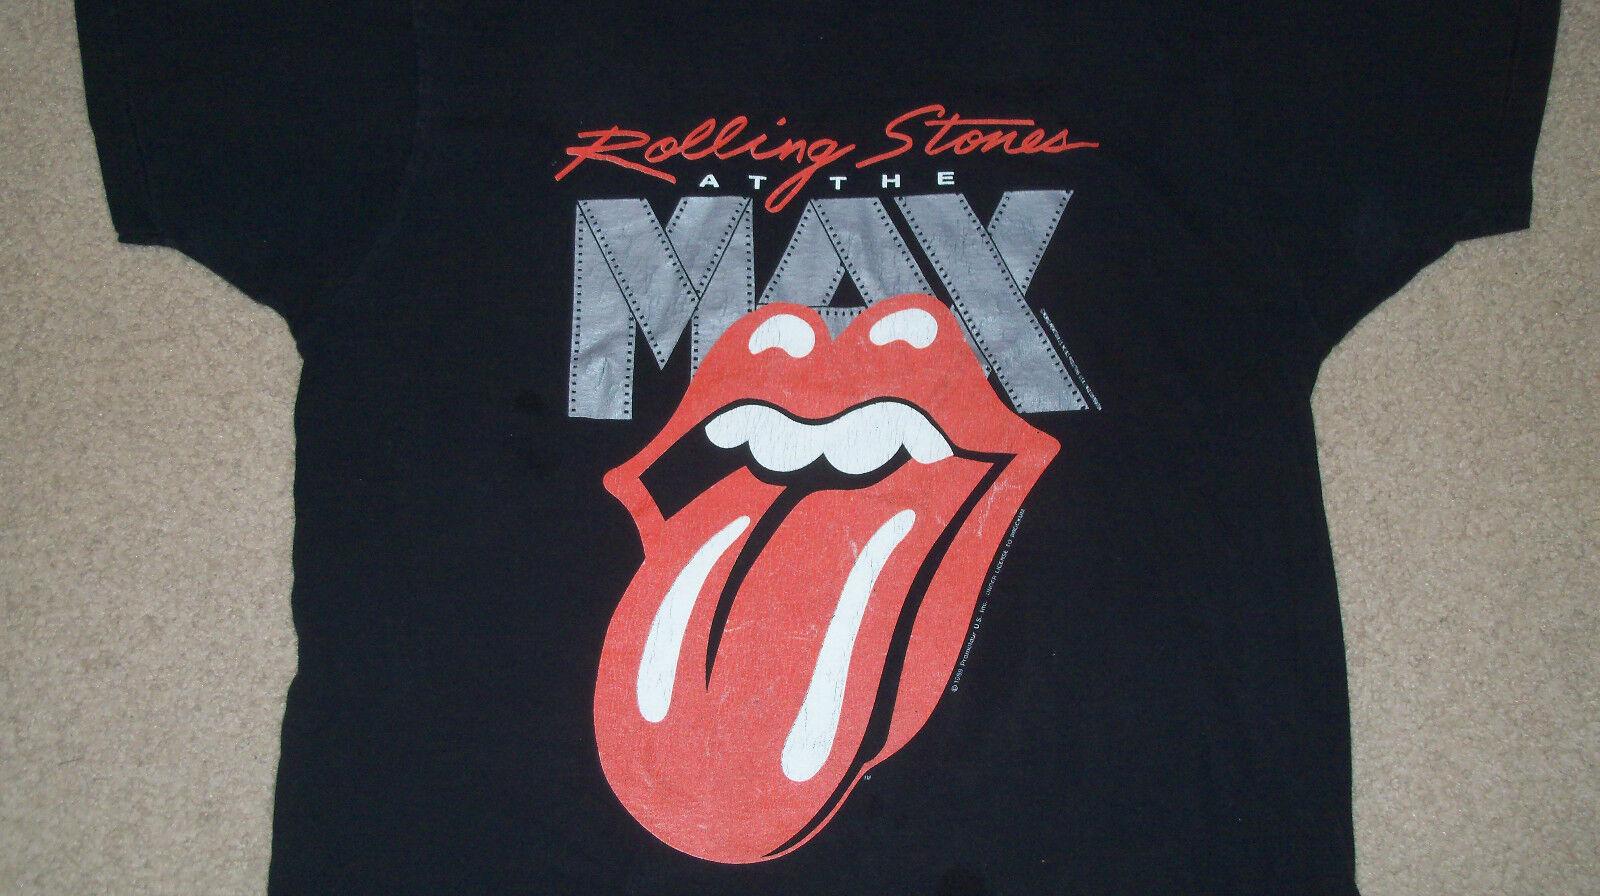 Vintage 1989 ROLLING STONES Live at the MAX T-hemd XL Brockum IMAX Steel Wheels